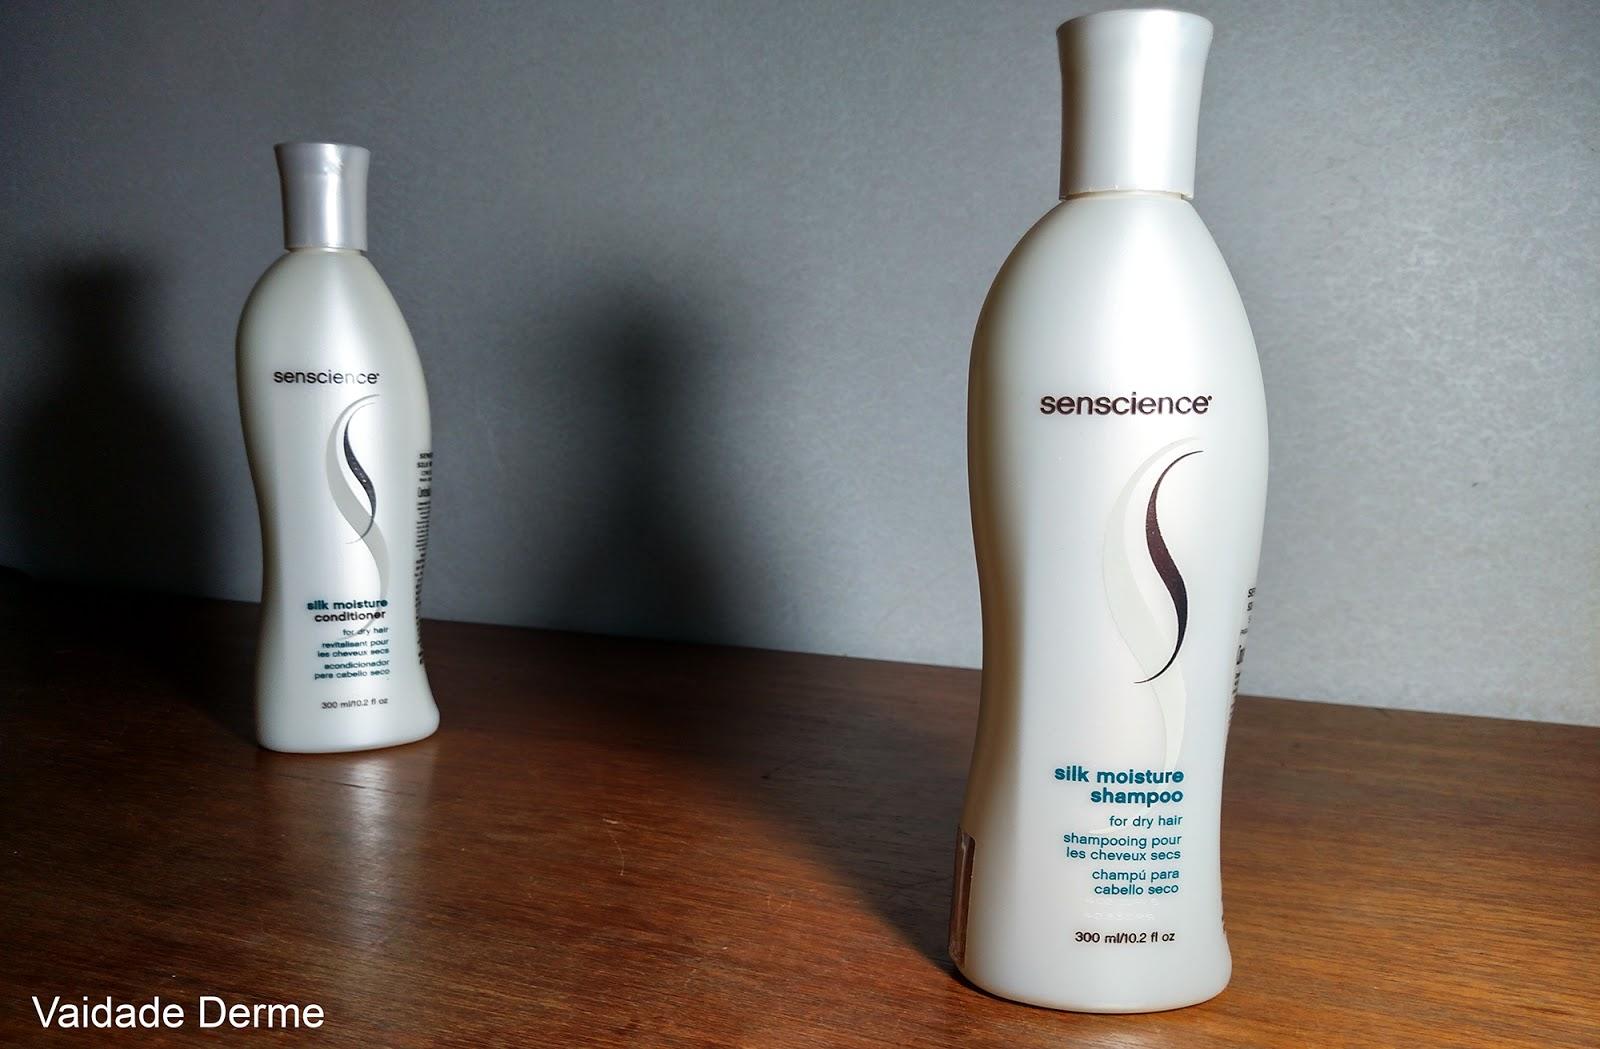 Senscience Silk Moisture